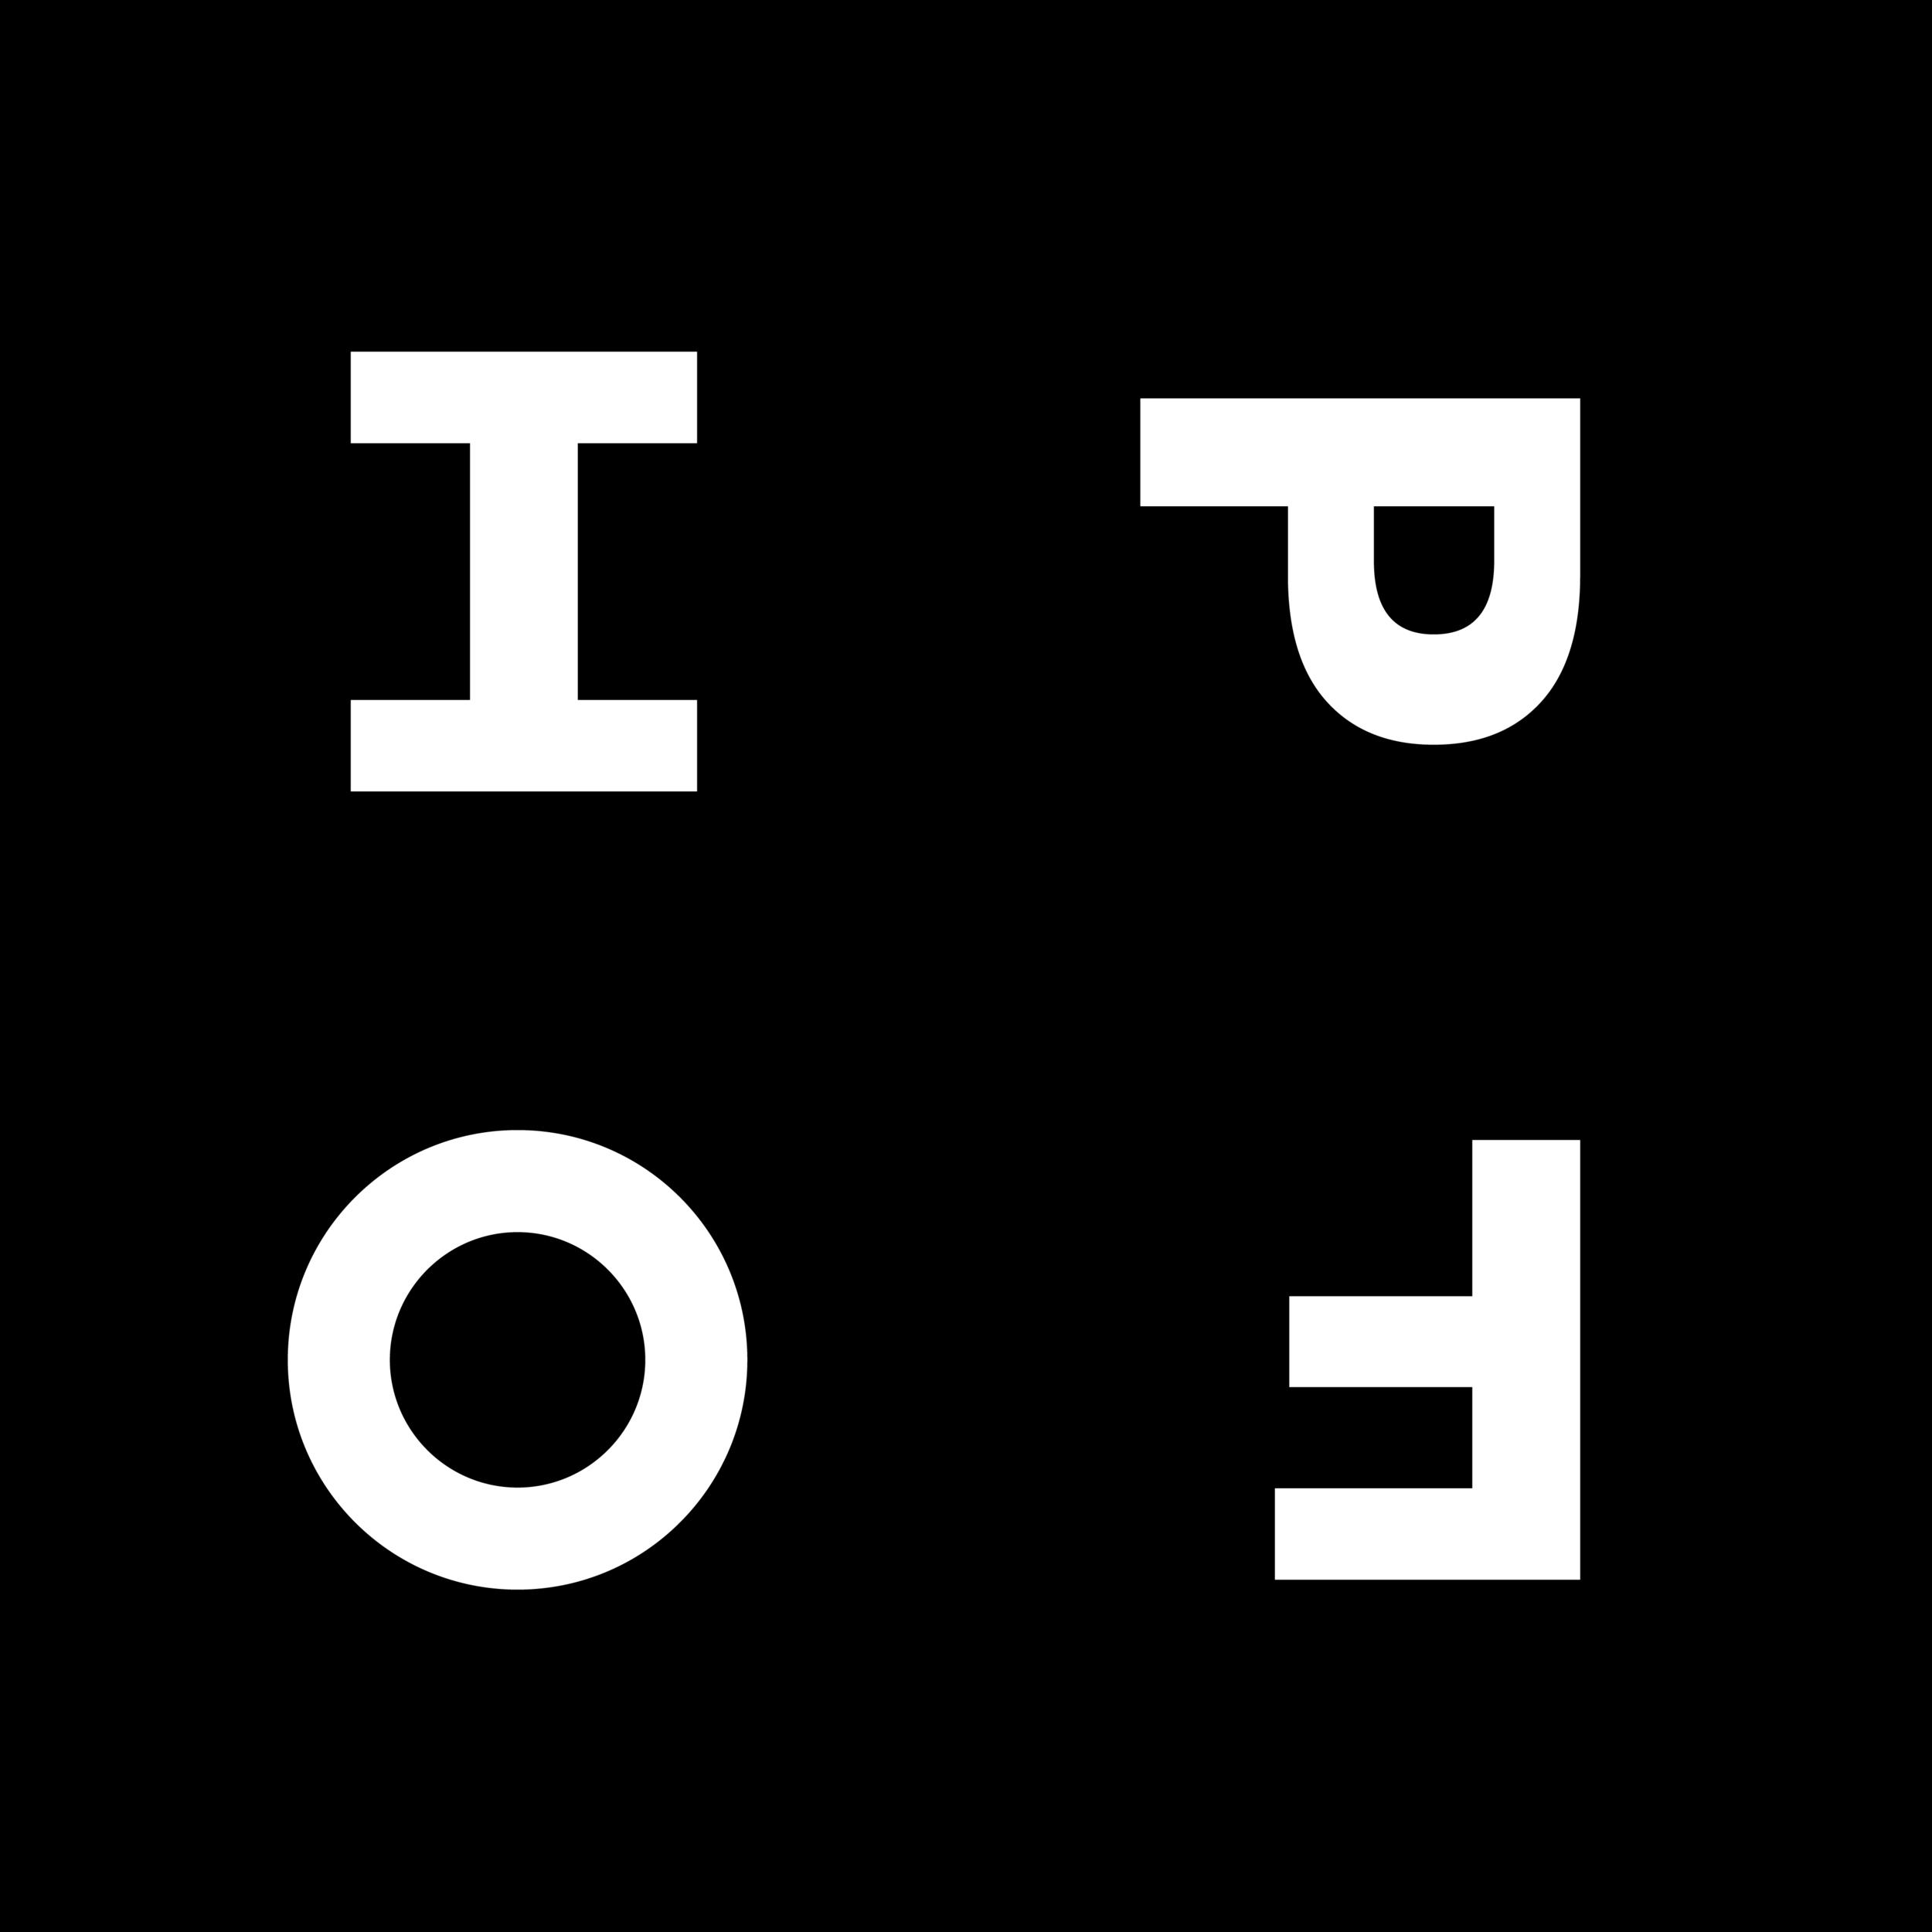 IPFO_Logo_Square_Savezone5.png